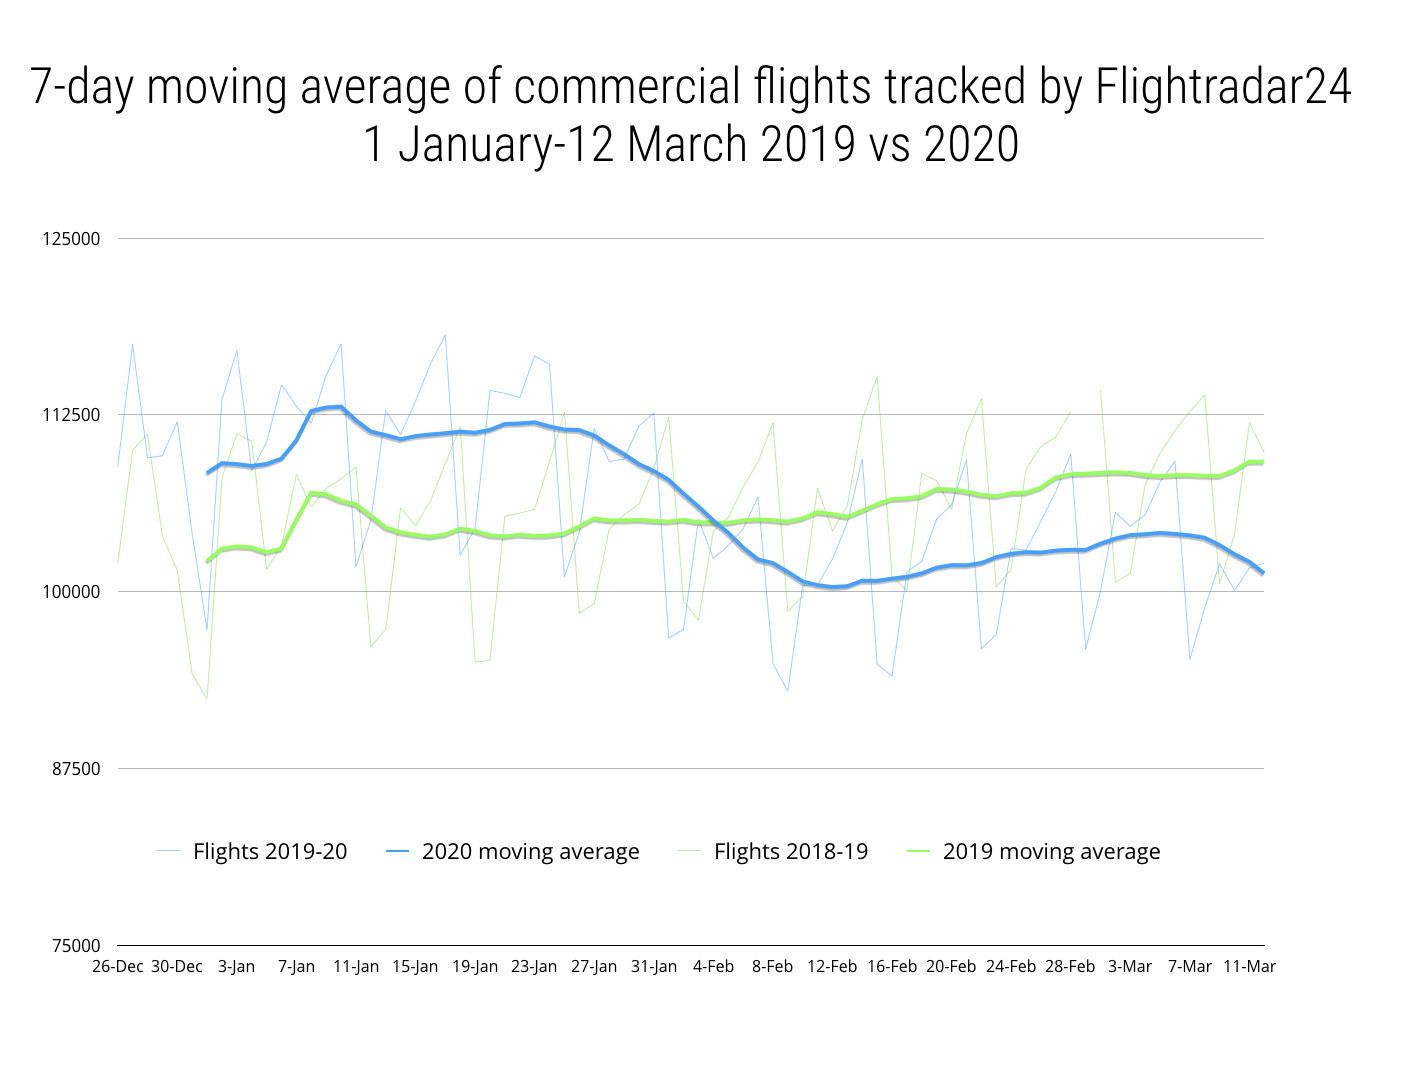 Decline in commercial flights in 2020